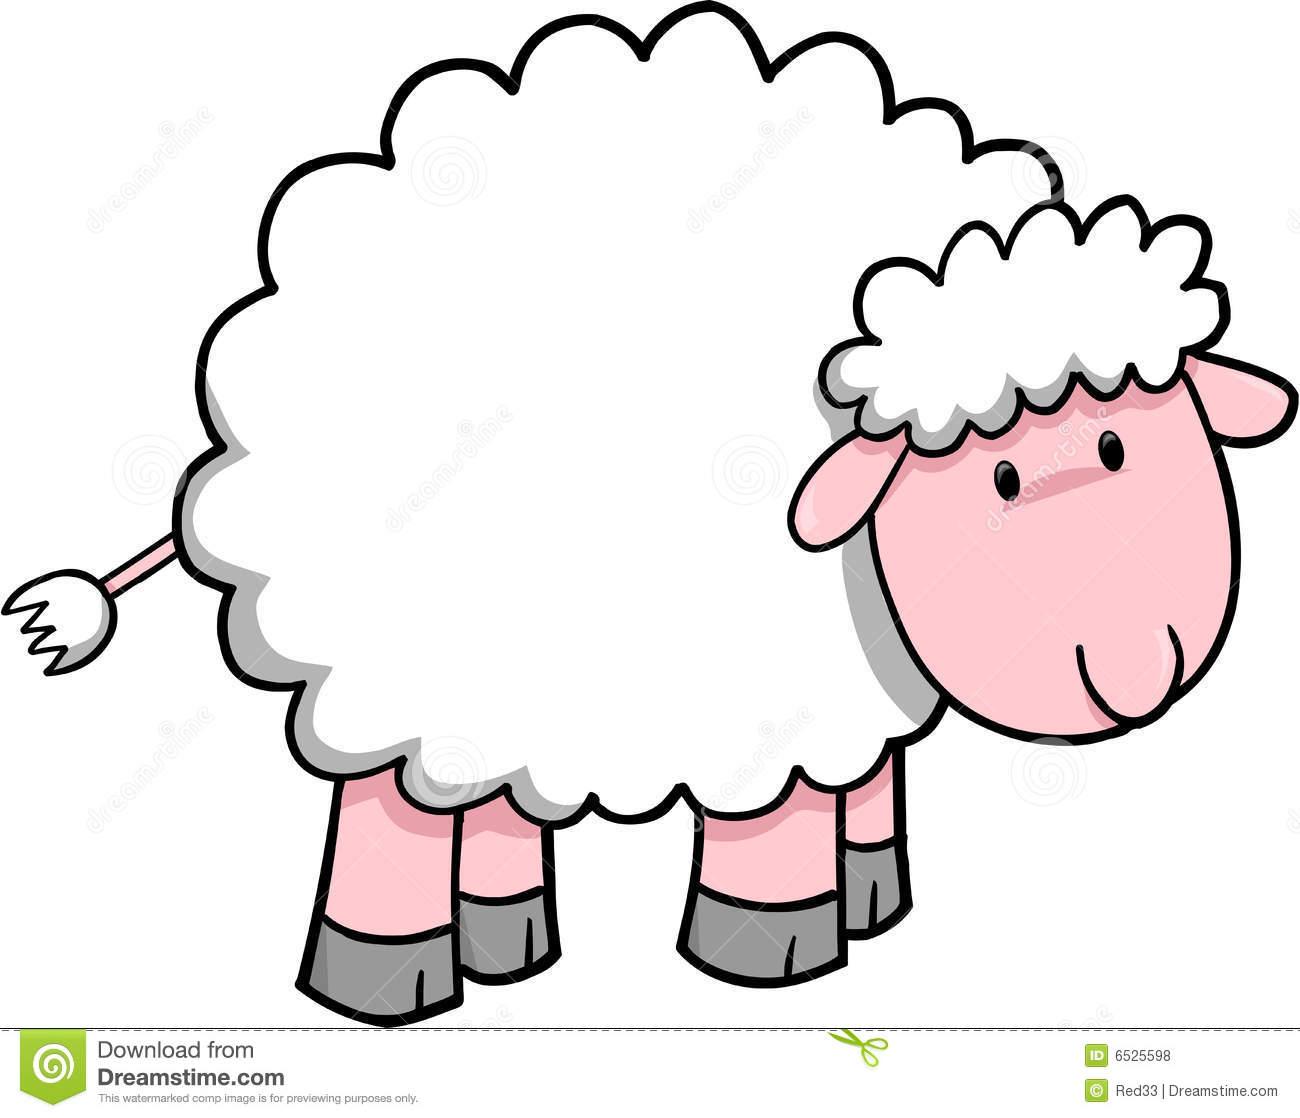 Baby Lamb Clipart Sheep Vector Illustrat-Baby Lamb Clipart Sheep Vector Illustration-12